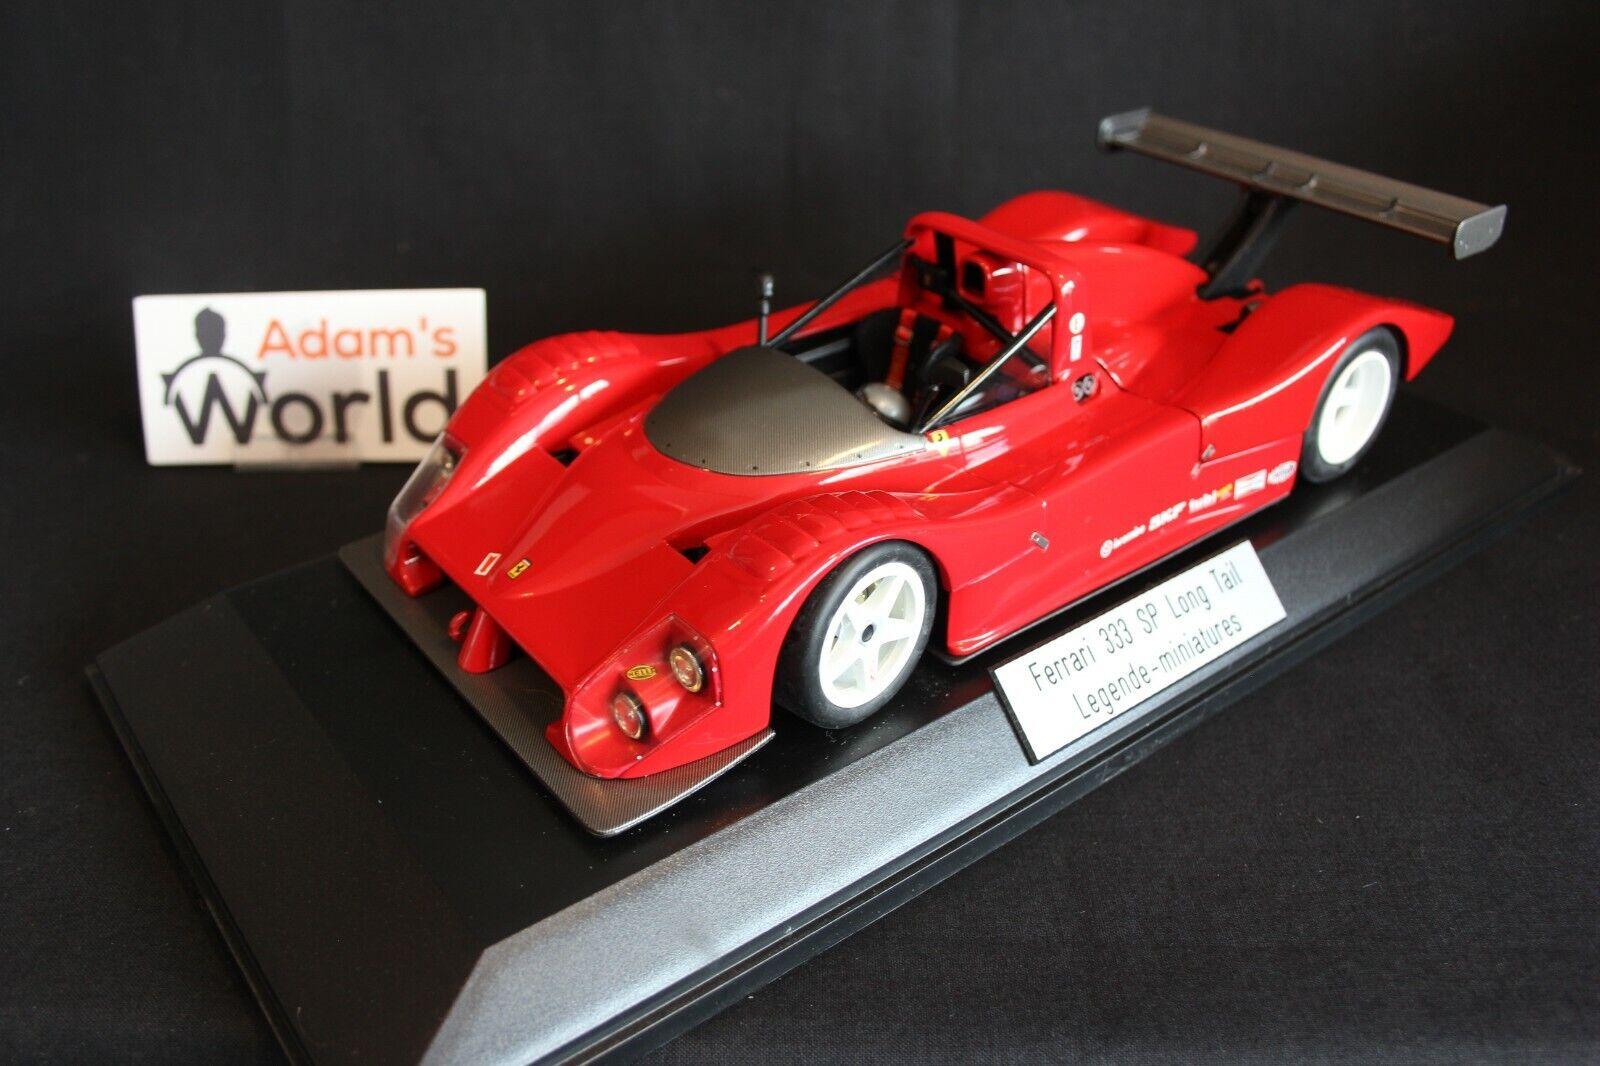 Hot Wheels transkit Ferrari 333 SP 1 18 Long Tail version (PJBB)